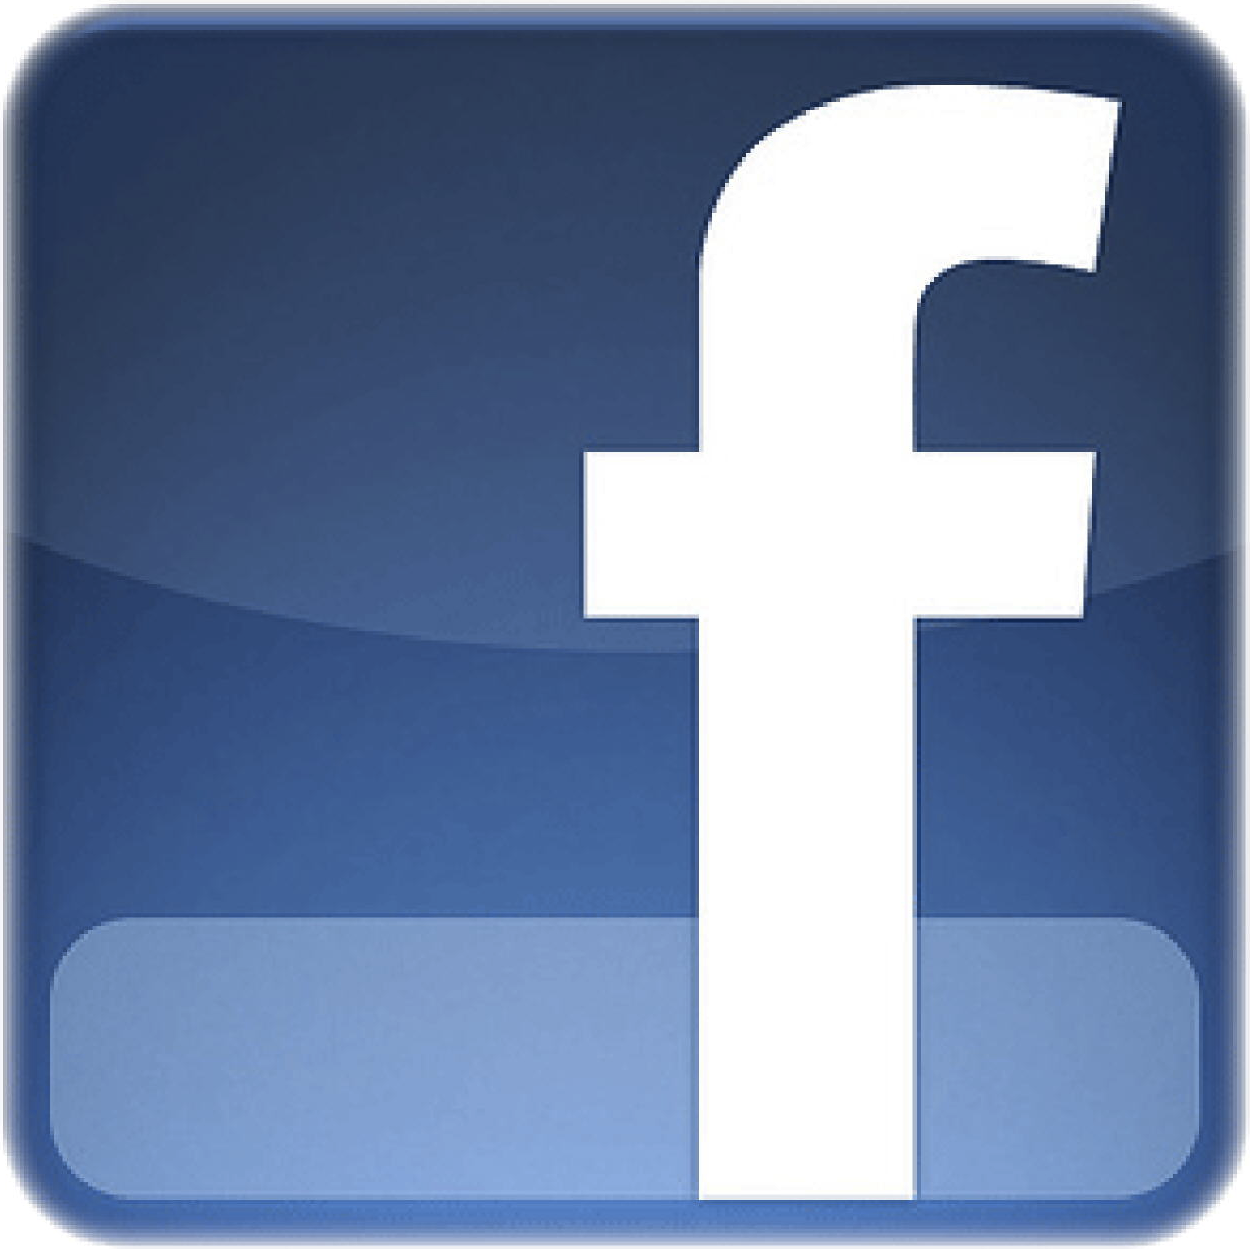 Marvellous-Facebook-Logo-For-Business-Cards-12-On-Cool-Logos-with-Facebook-Logo-For-Business-Cards.jpg